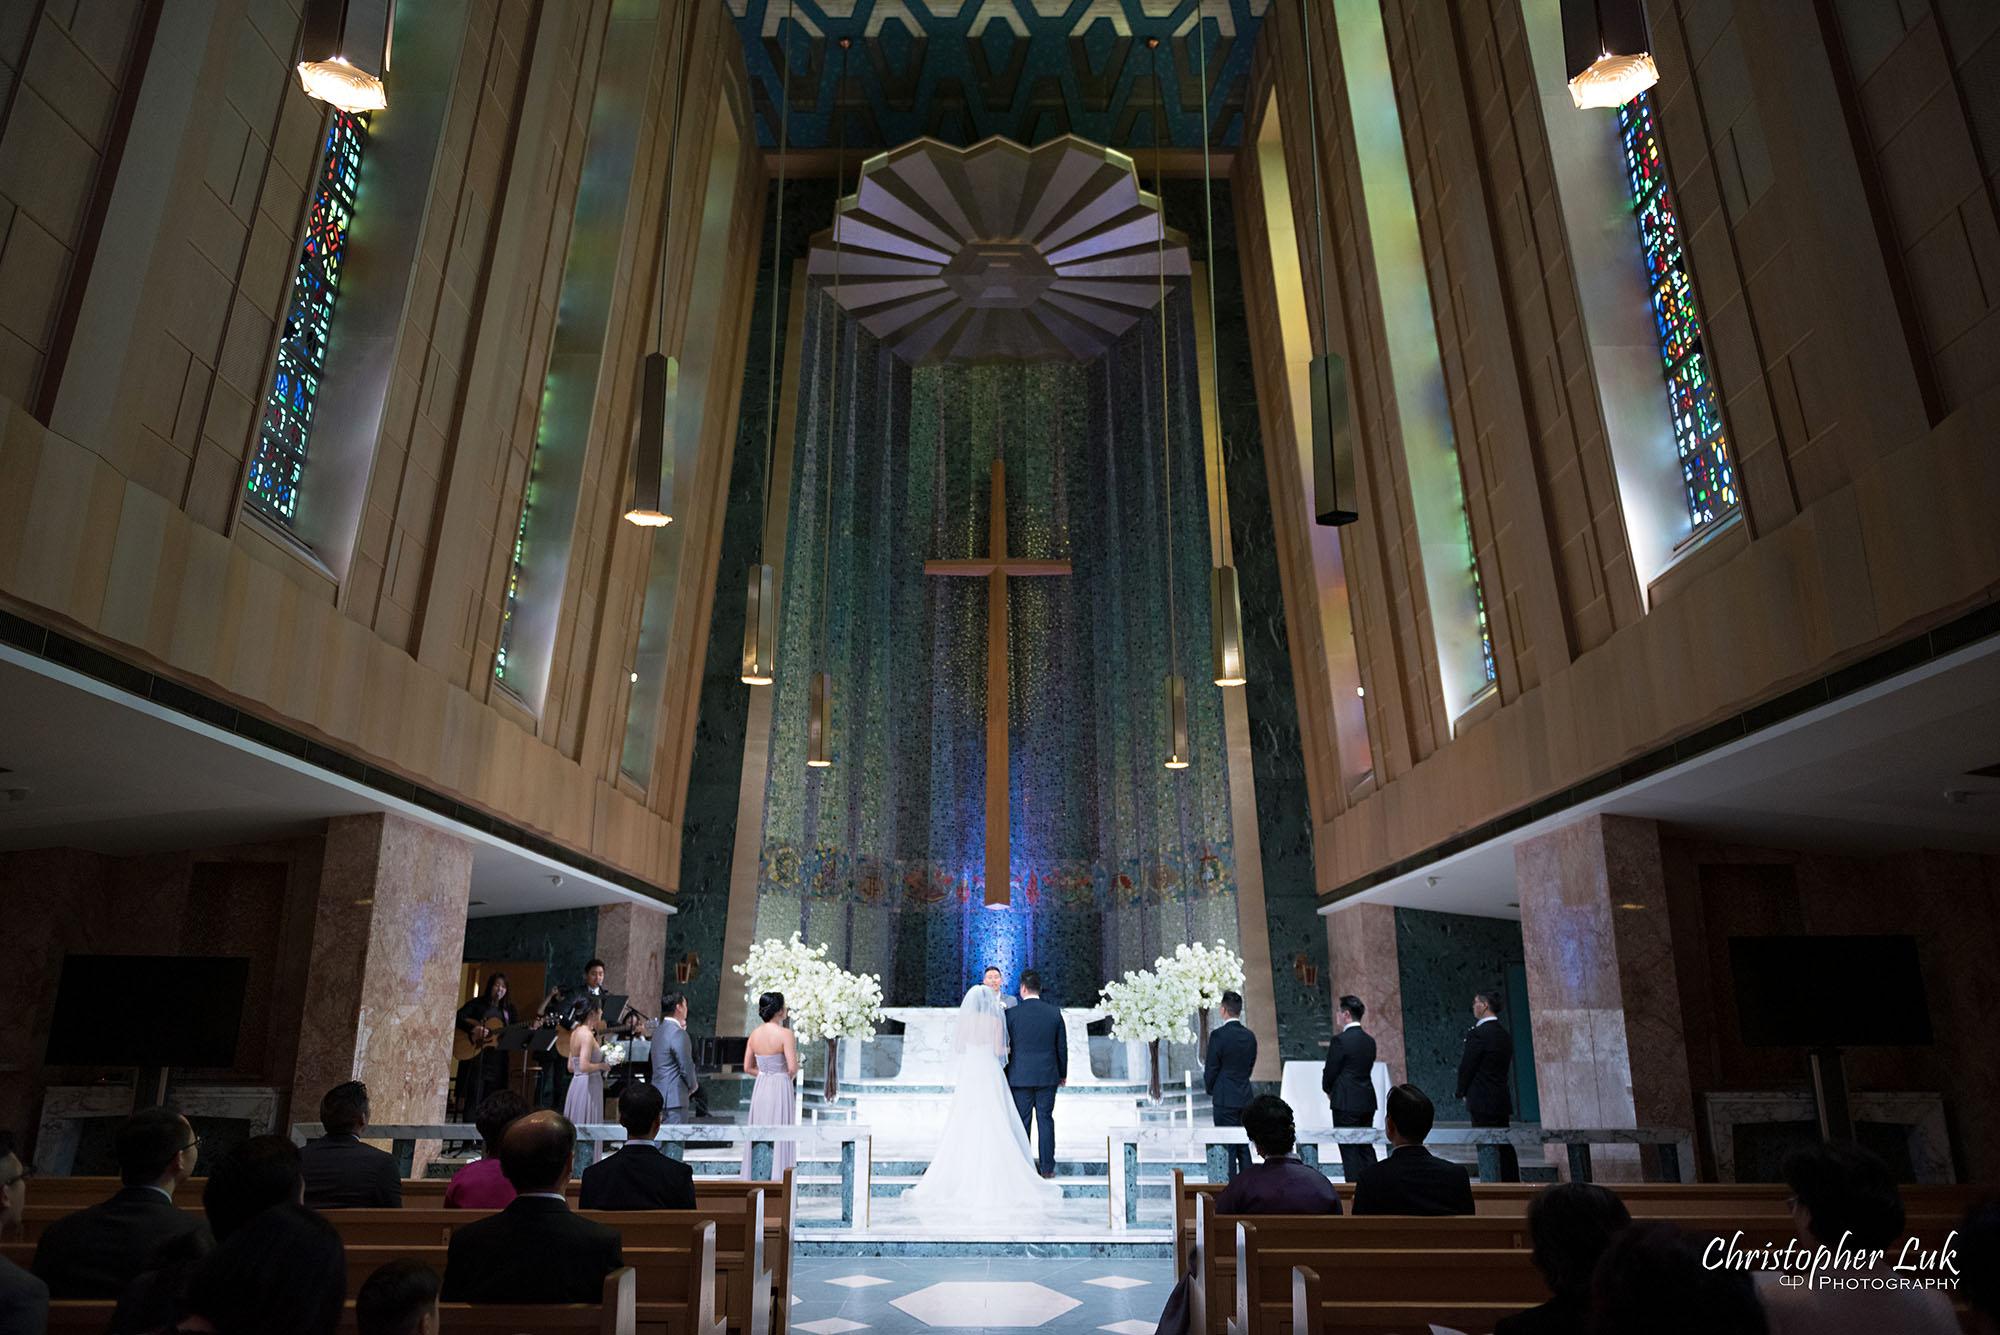 Christopher Luk Toronto Wedding Photography Tyndale Chapel Church Ceremony Venue Location Bride Groom Altar Landscape